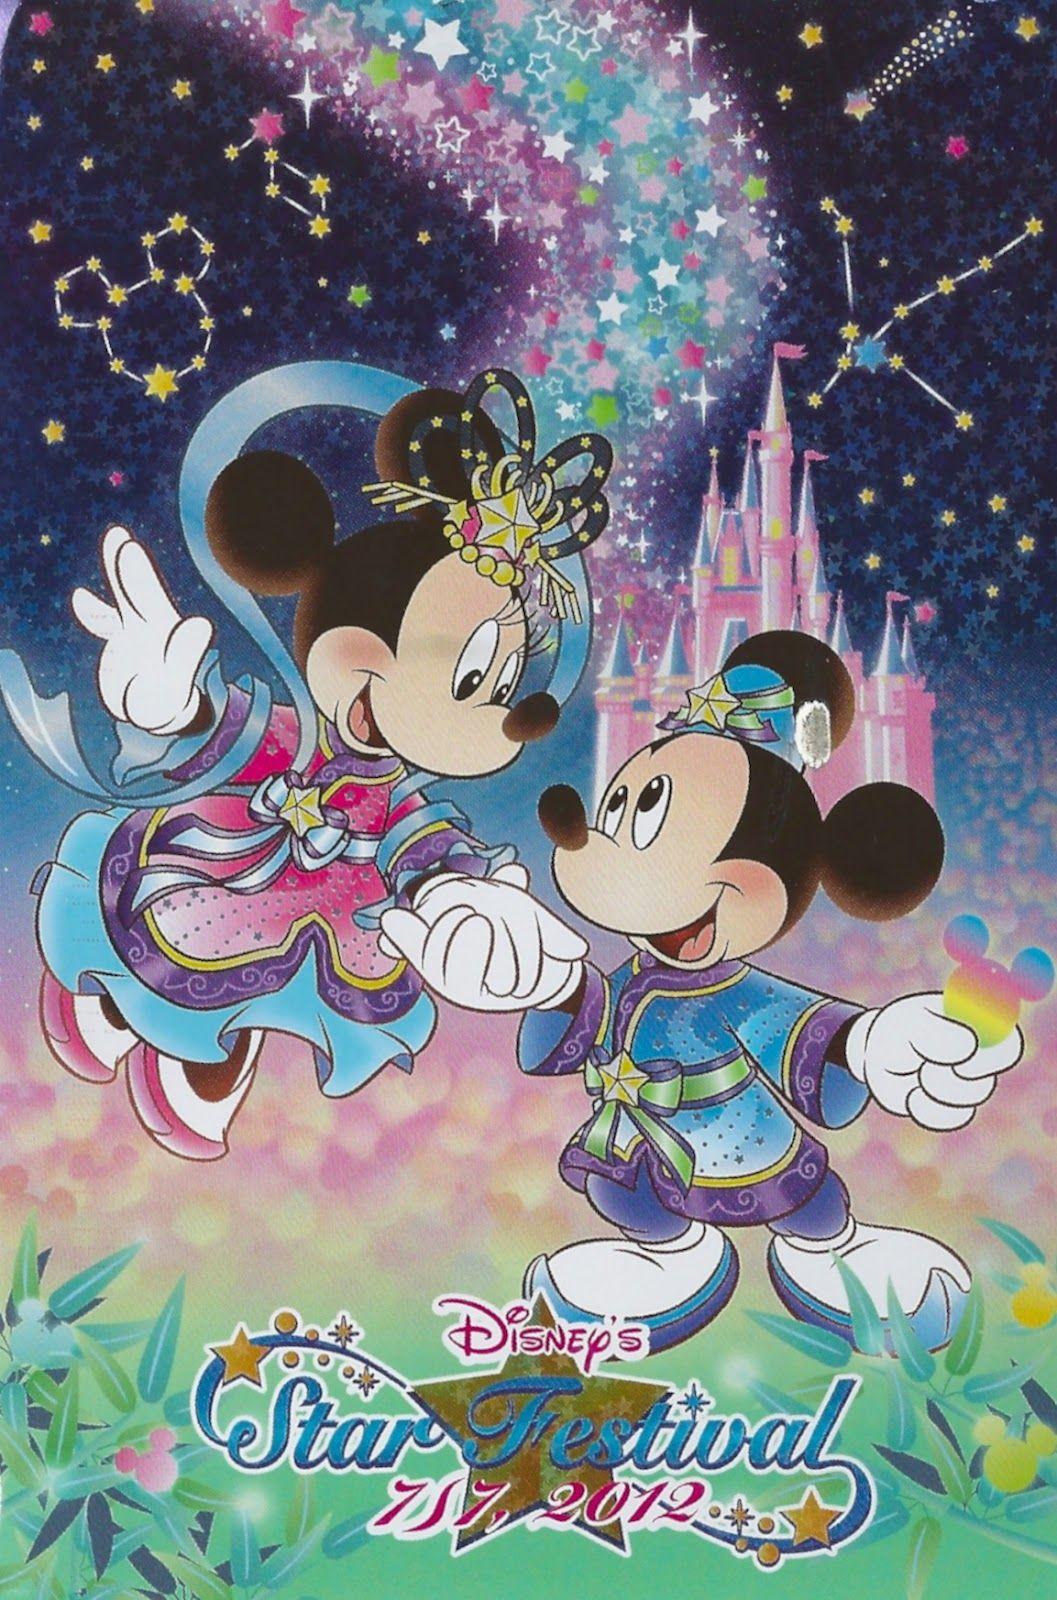 Mickey おしゃれまとめの人気アイデア Pinterest Yvette Van Laerhoven ディズニー 七夕 ディズニー イラスト ミッキー イラスト